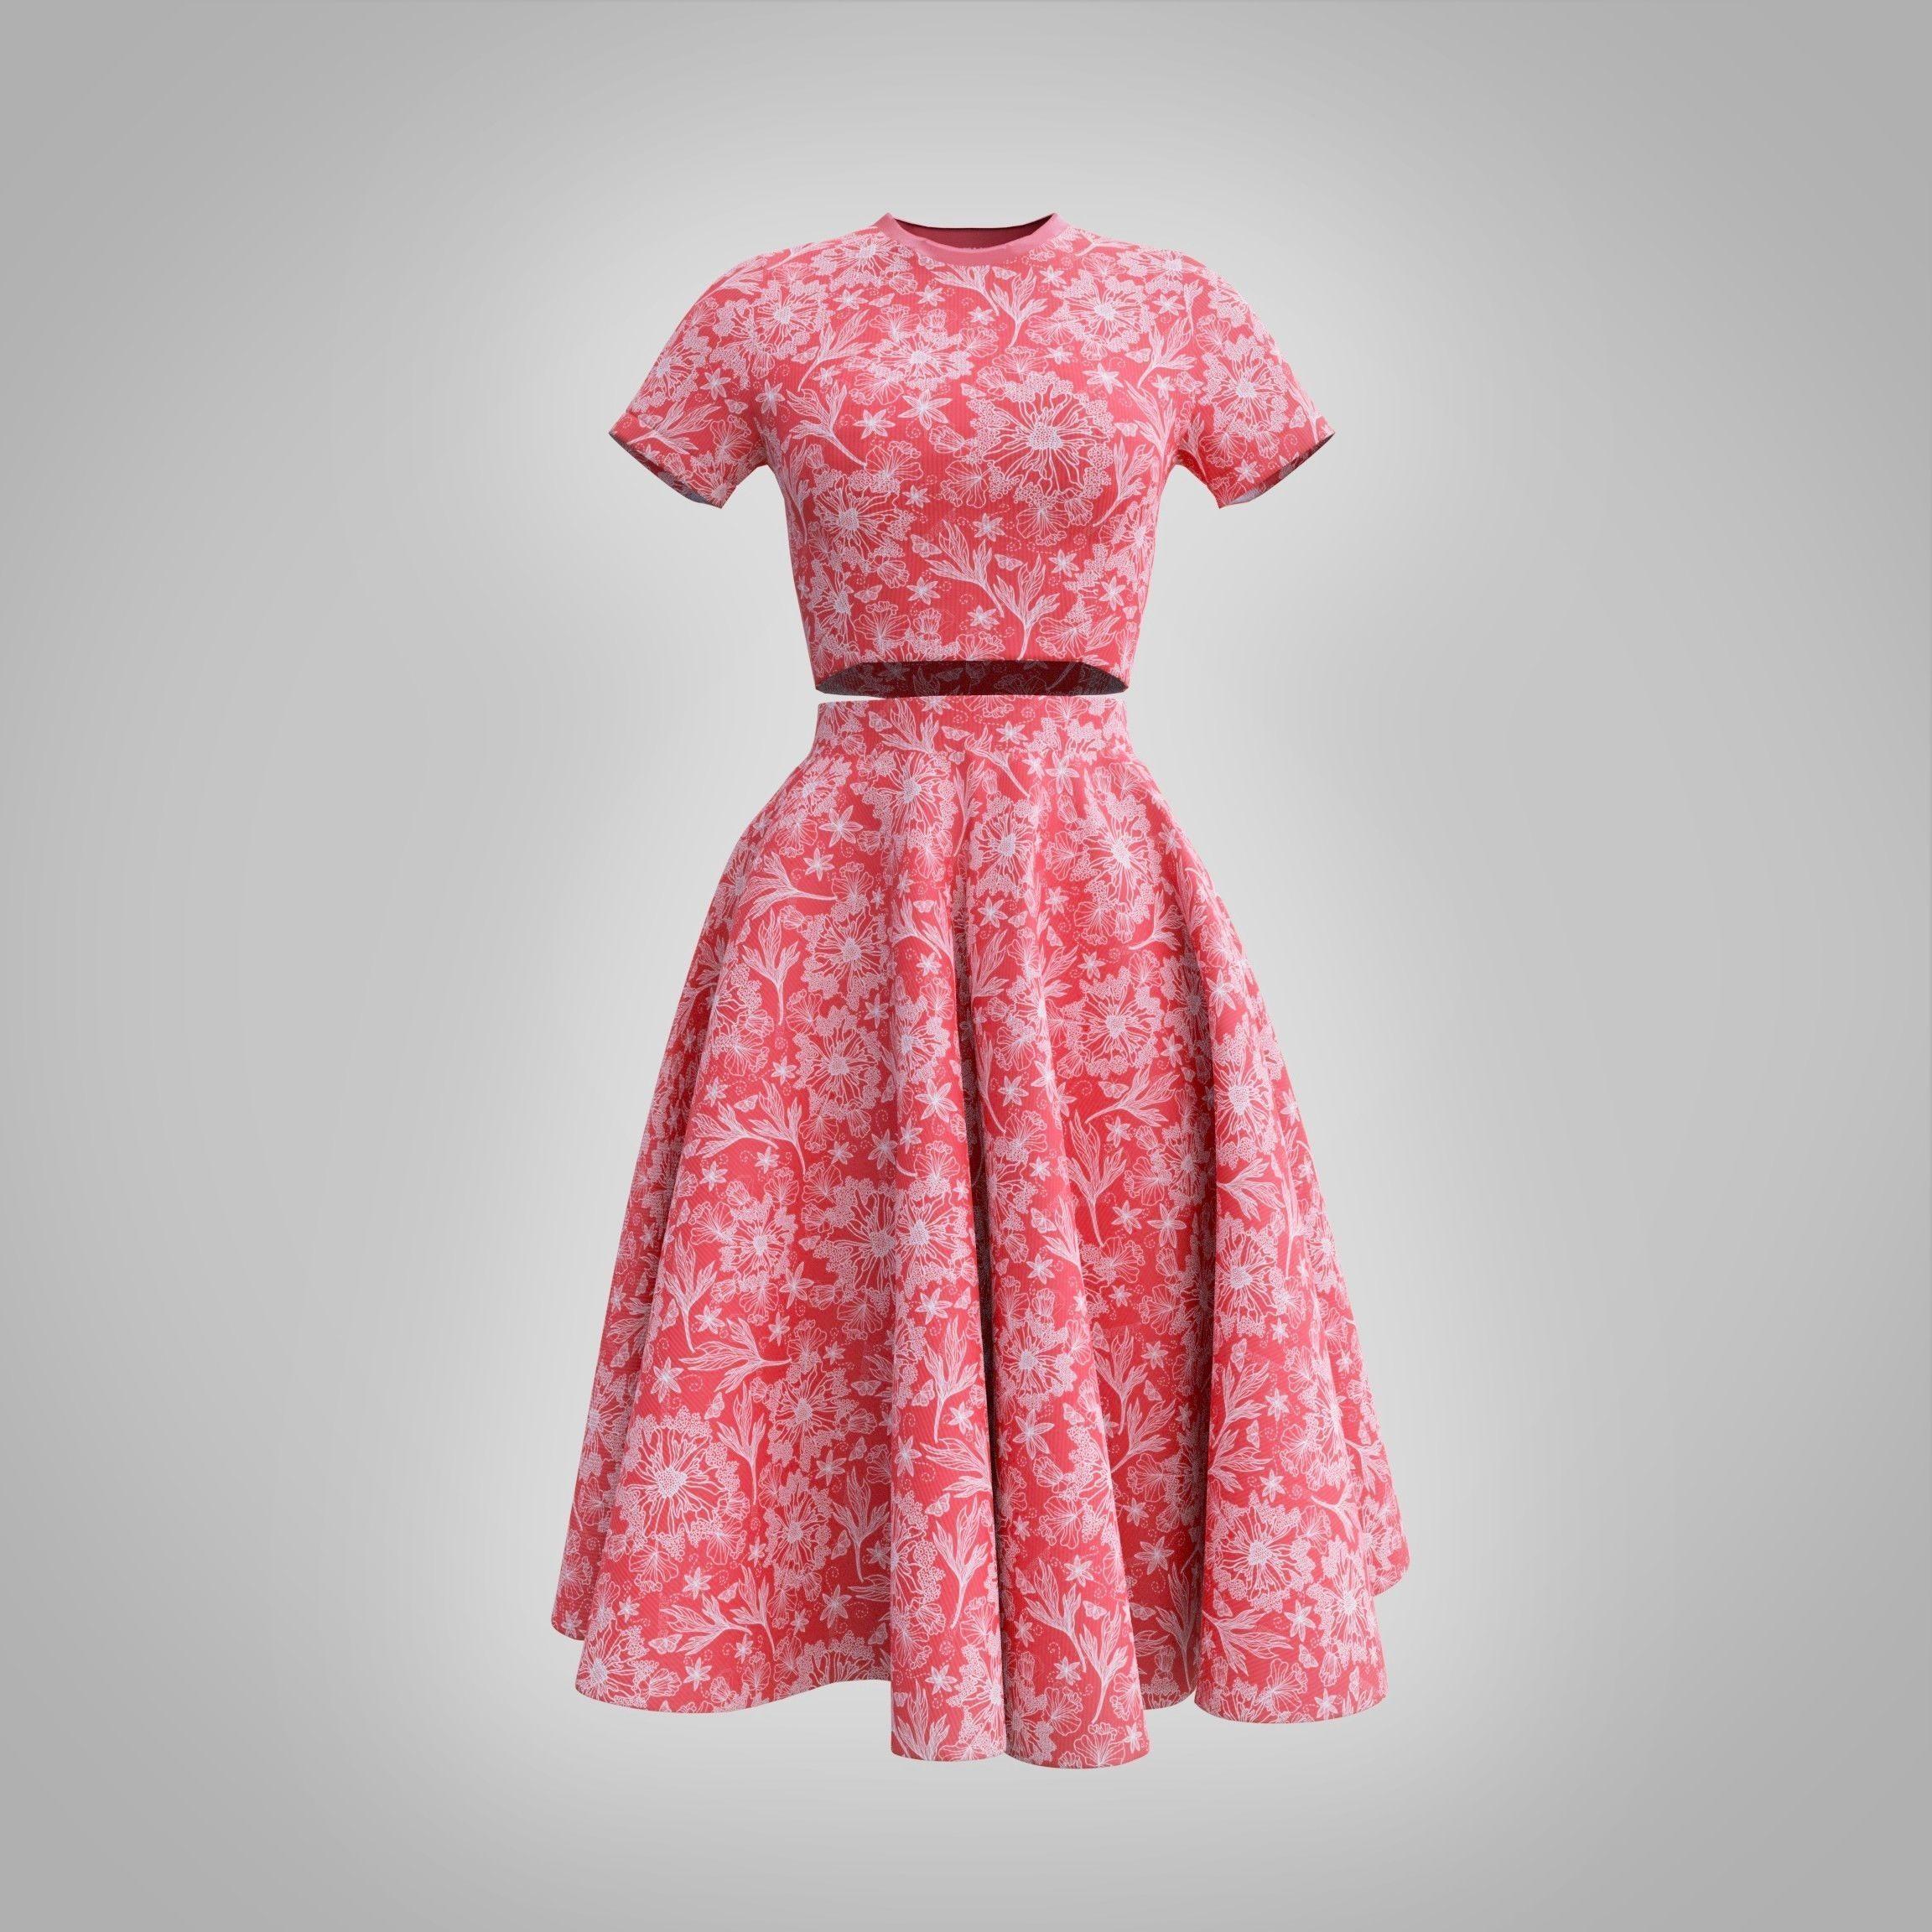 fancy dress - croptop and circle skirt